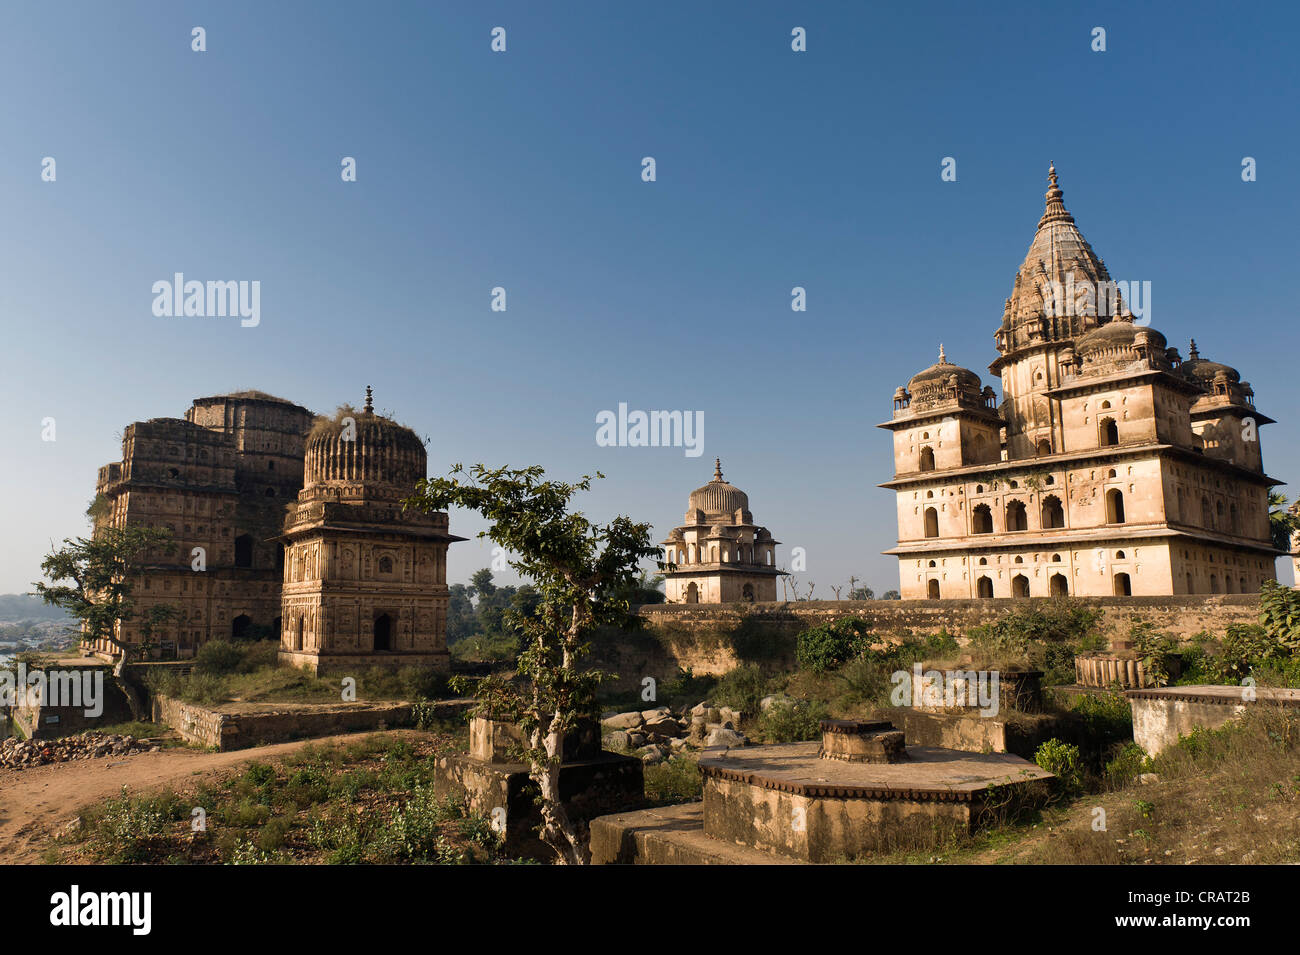 Chhatris grave monuments or cenotaphs, Orchha, Madhya Pradesh, North India, India, Asia - Stock Image